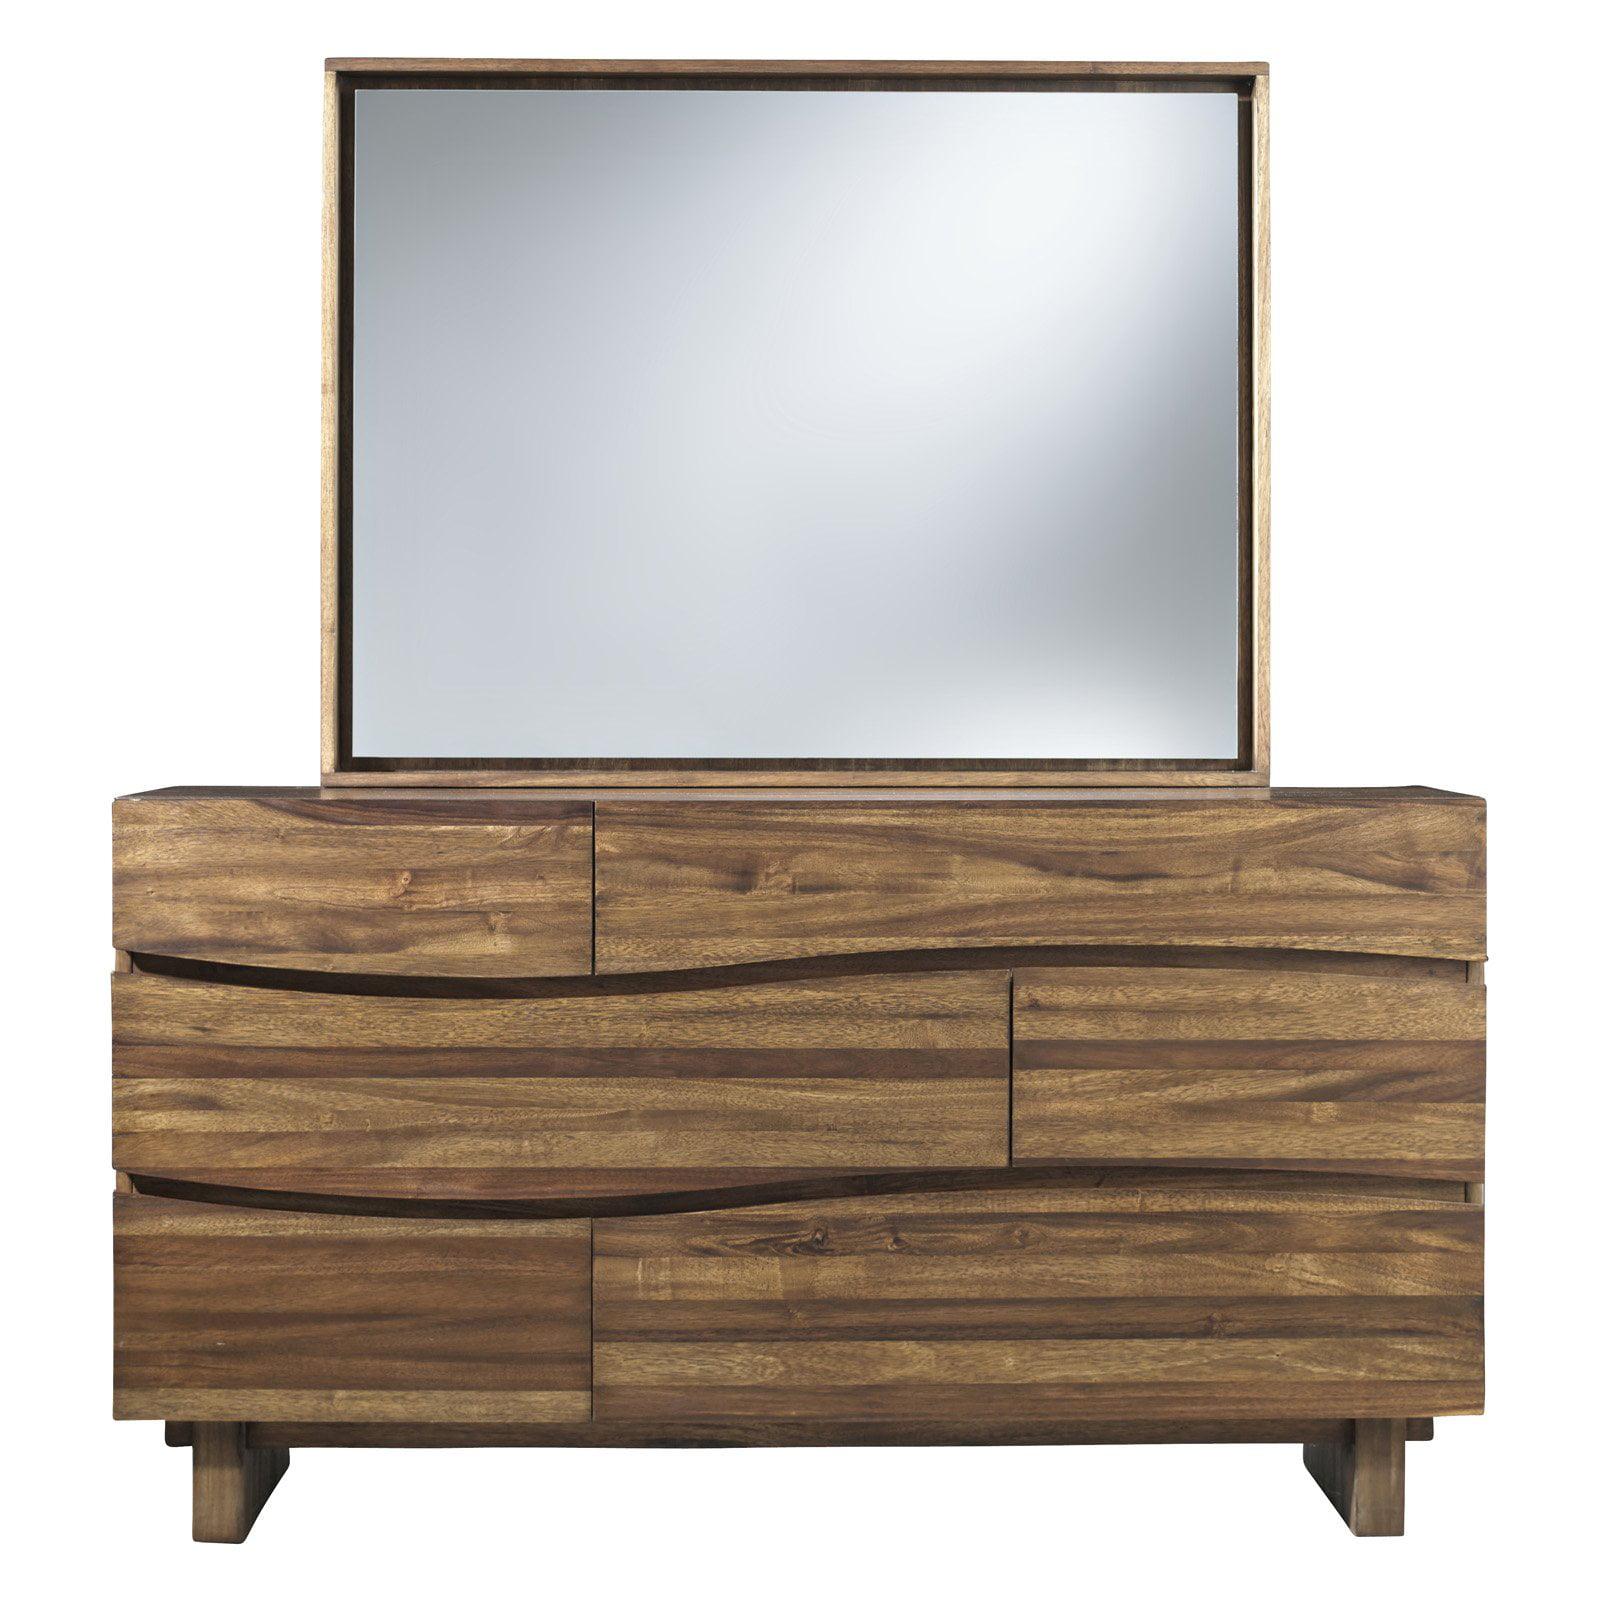 Modus Ocean 6-Drawer Dresser with Optional Mirror by Modus Furniture